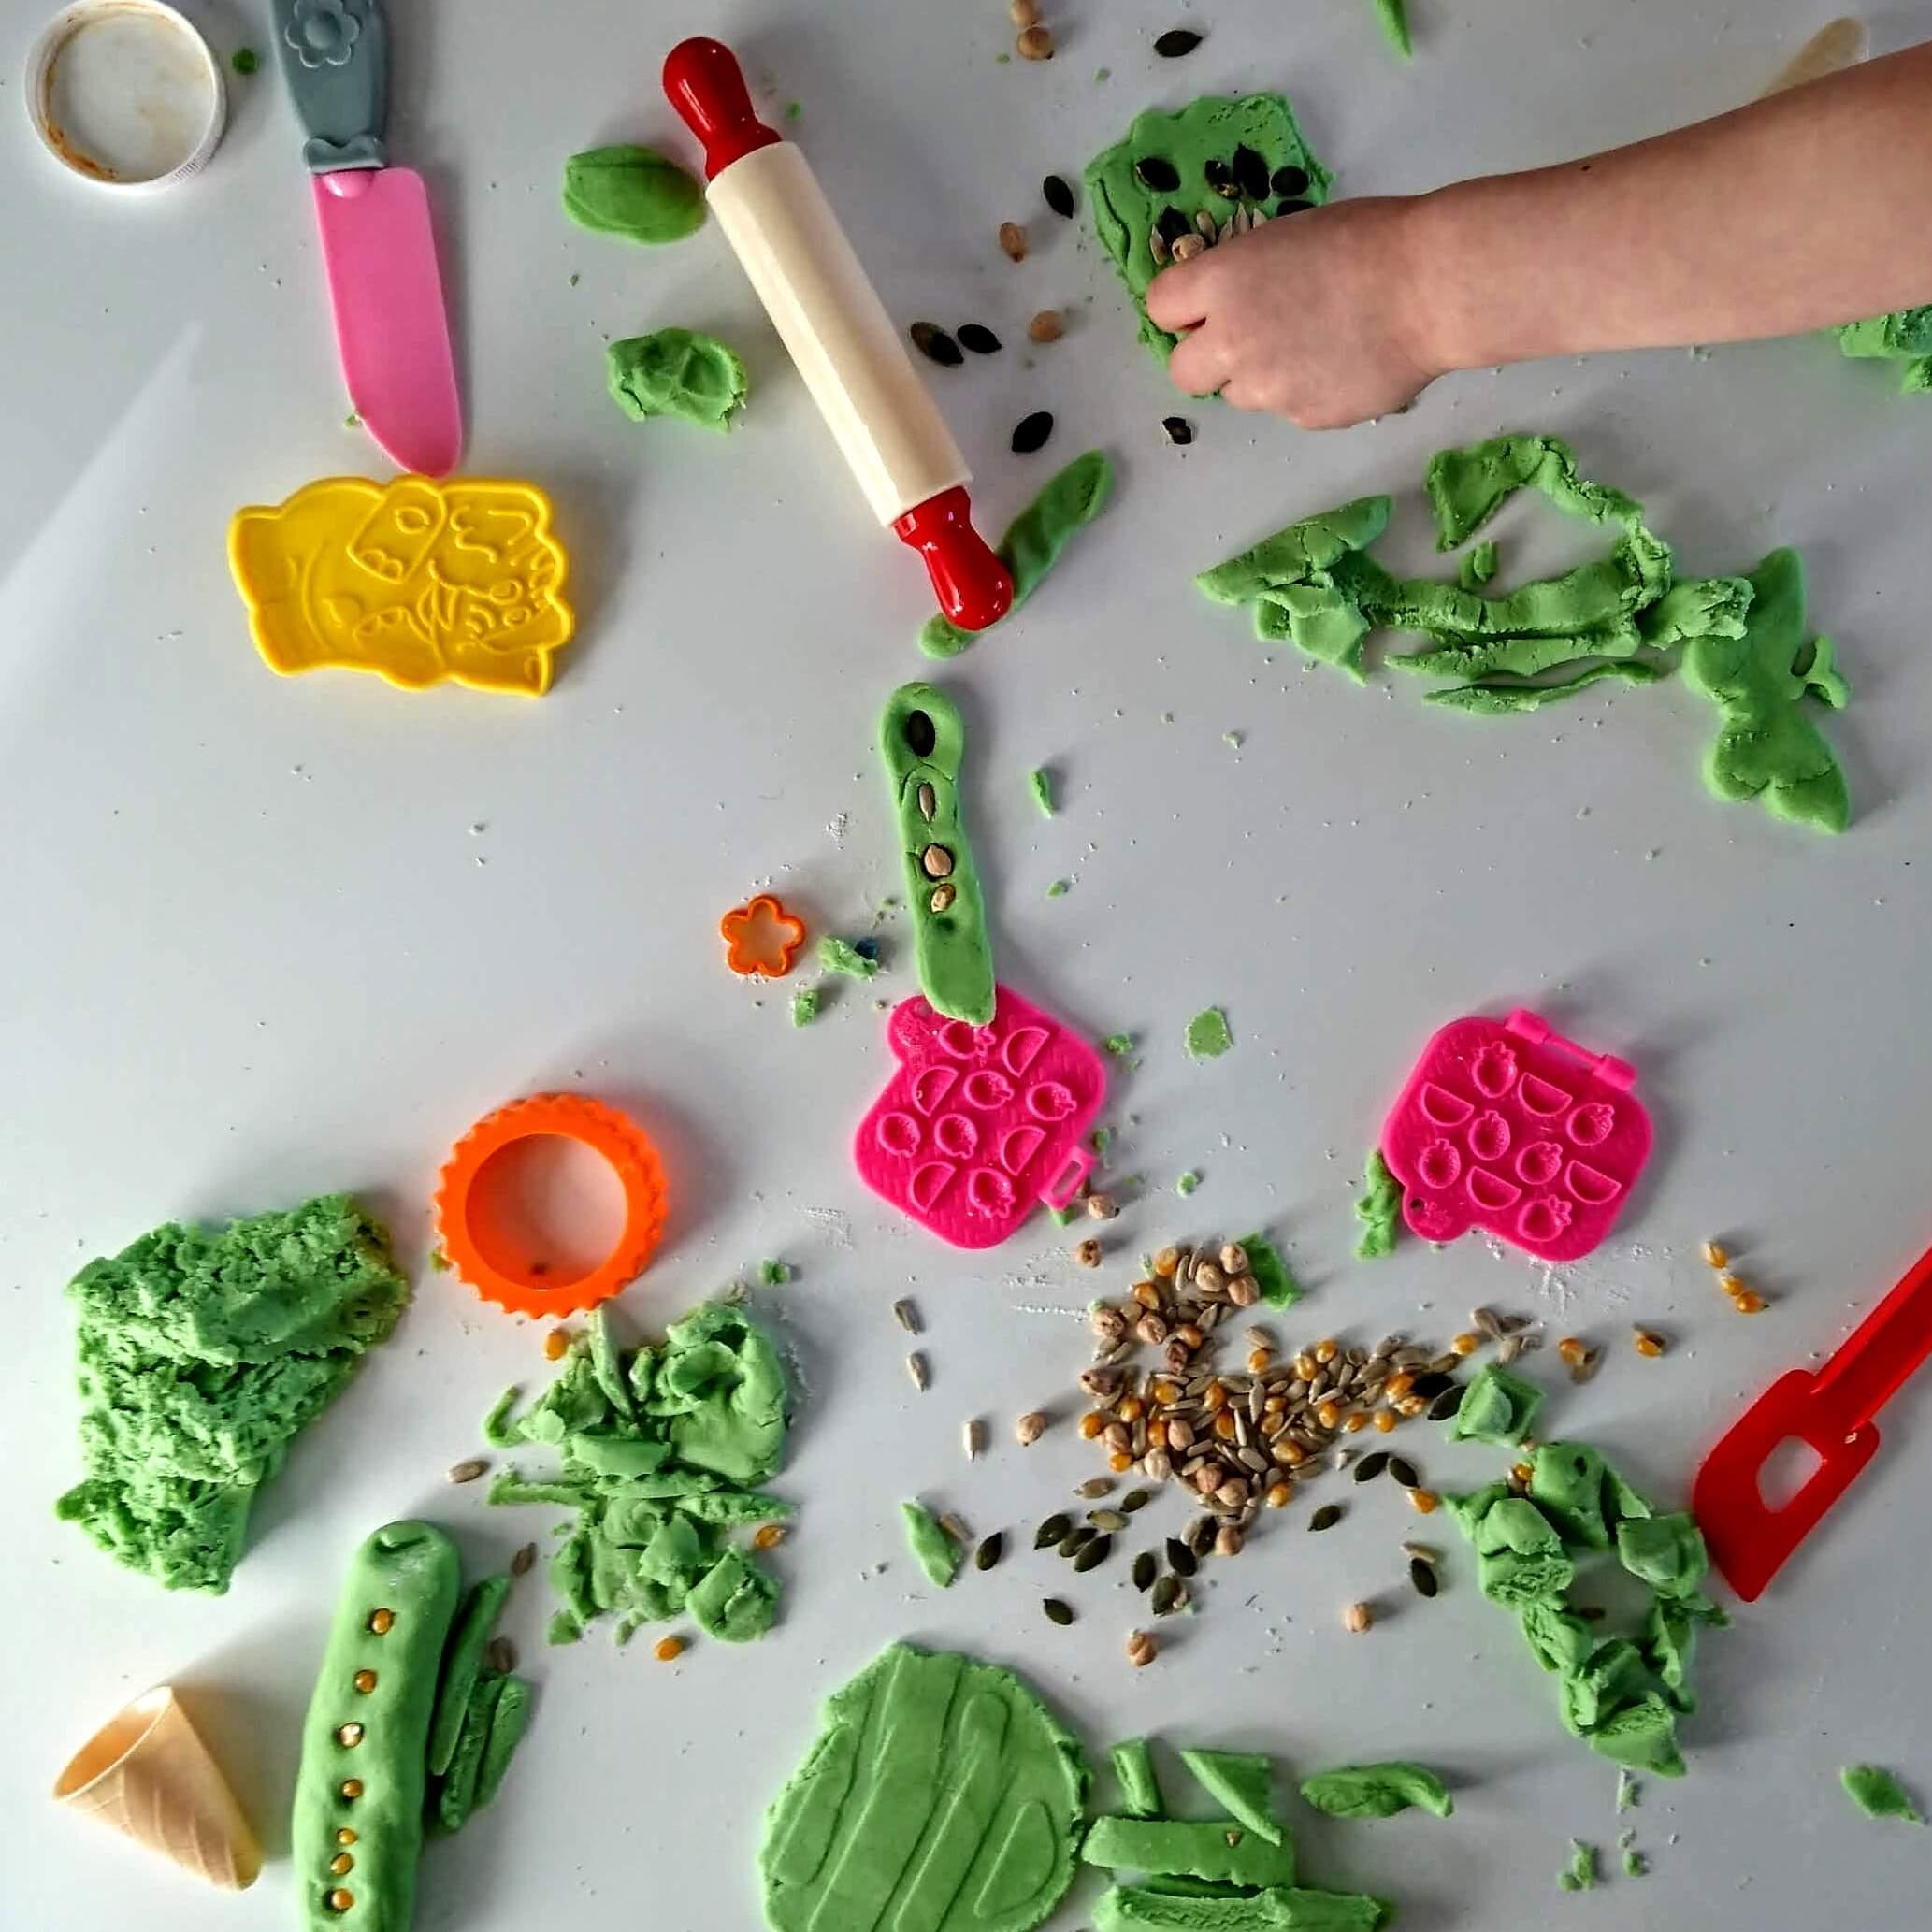 invitation to create playdough mandala art